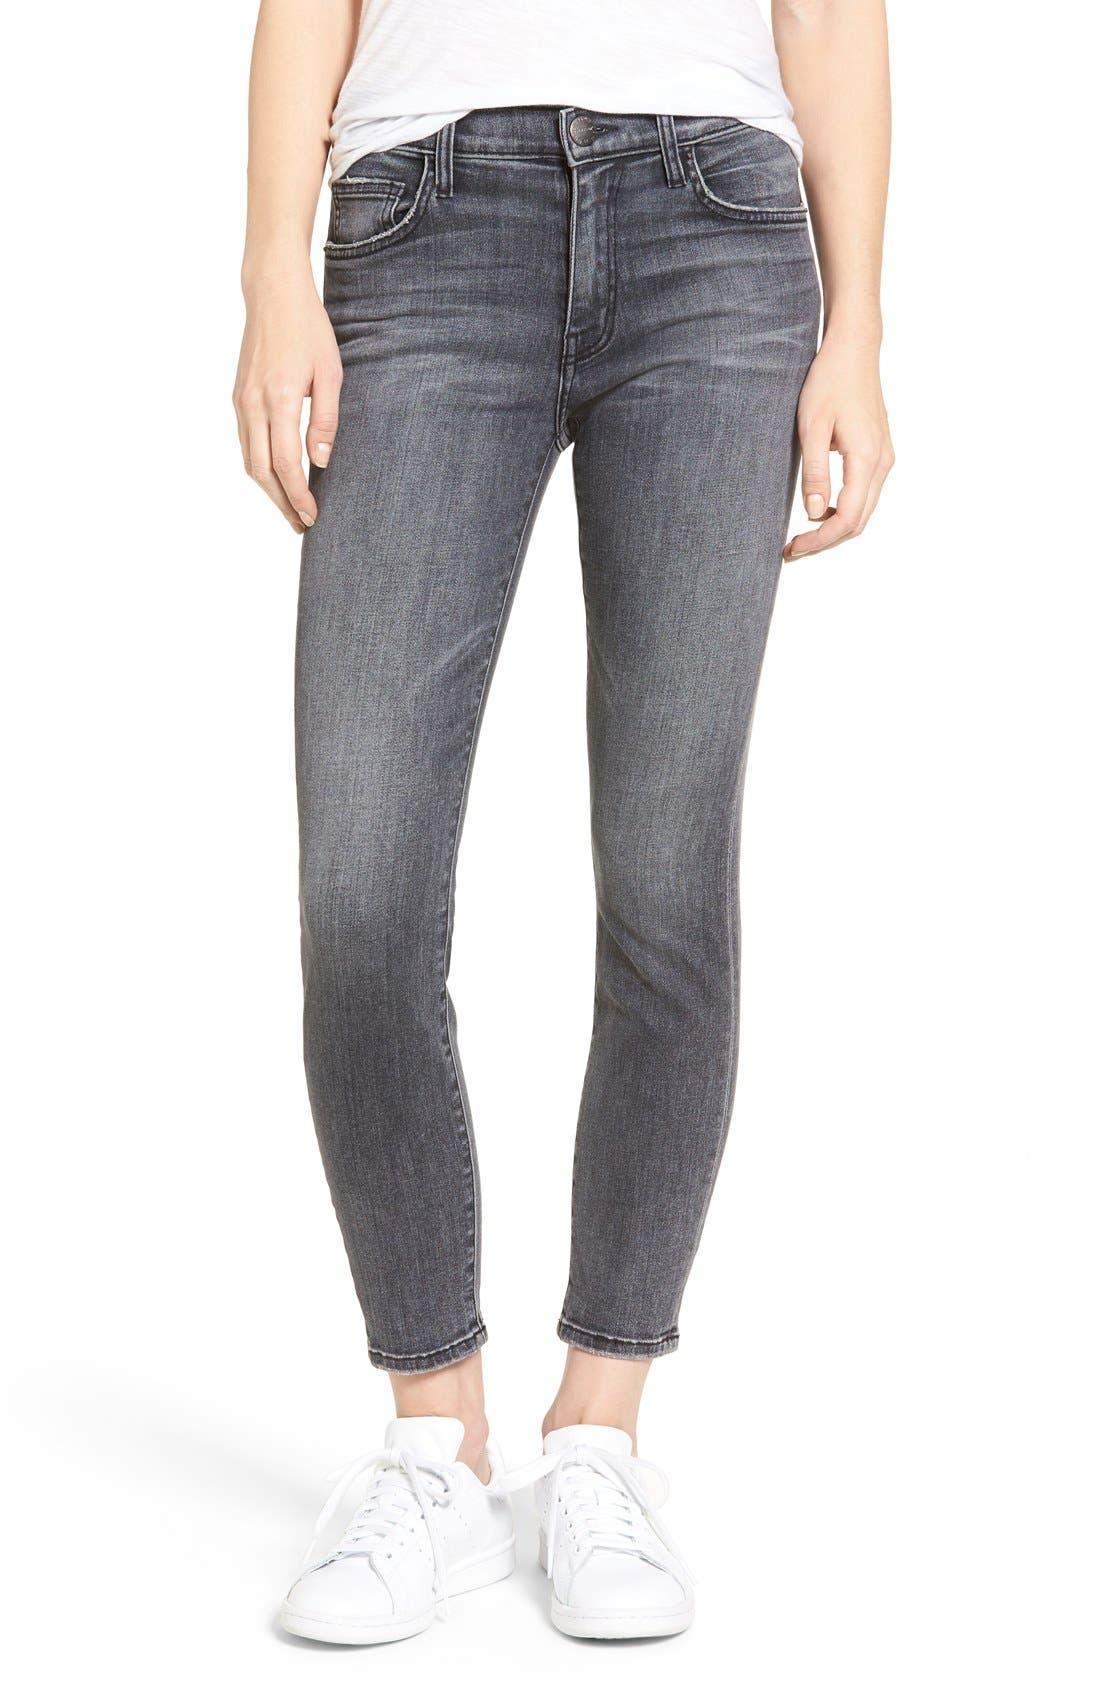 Main Image - Current/Elliott The High Waist Stiletto Ankle Skinny Jeans (Everett)